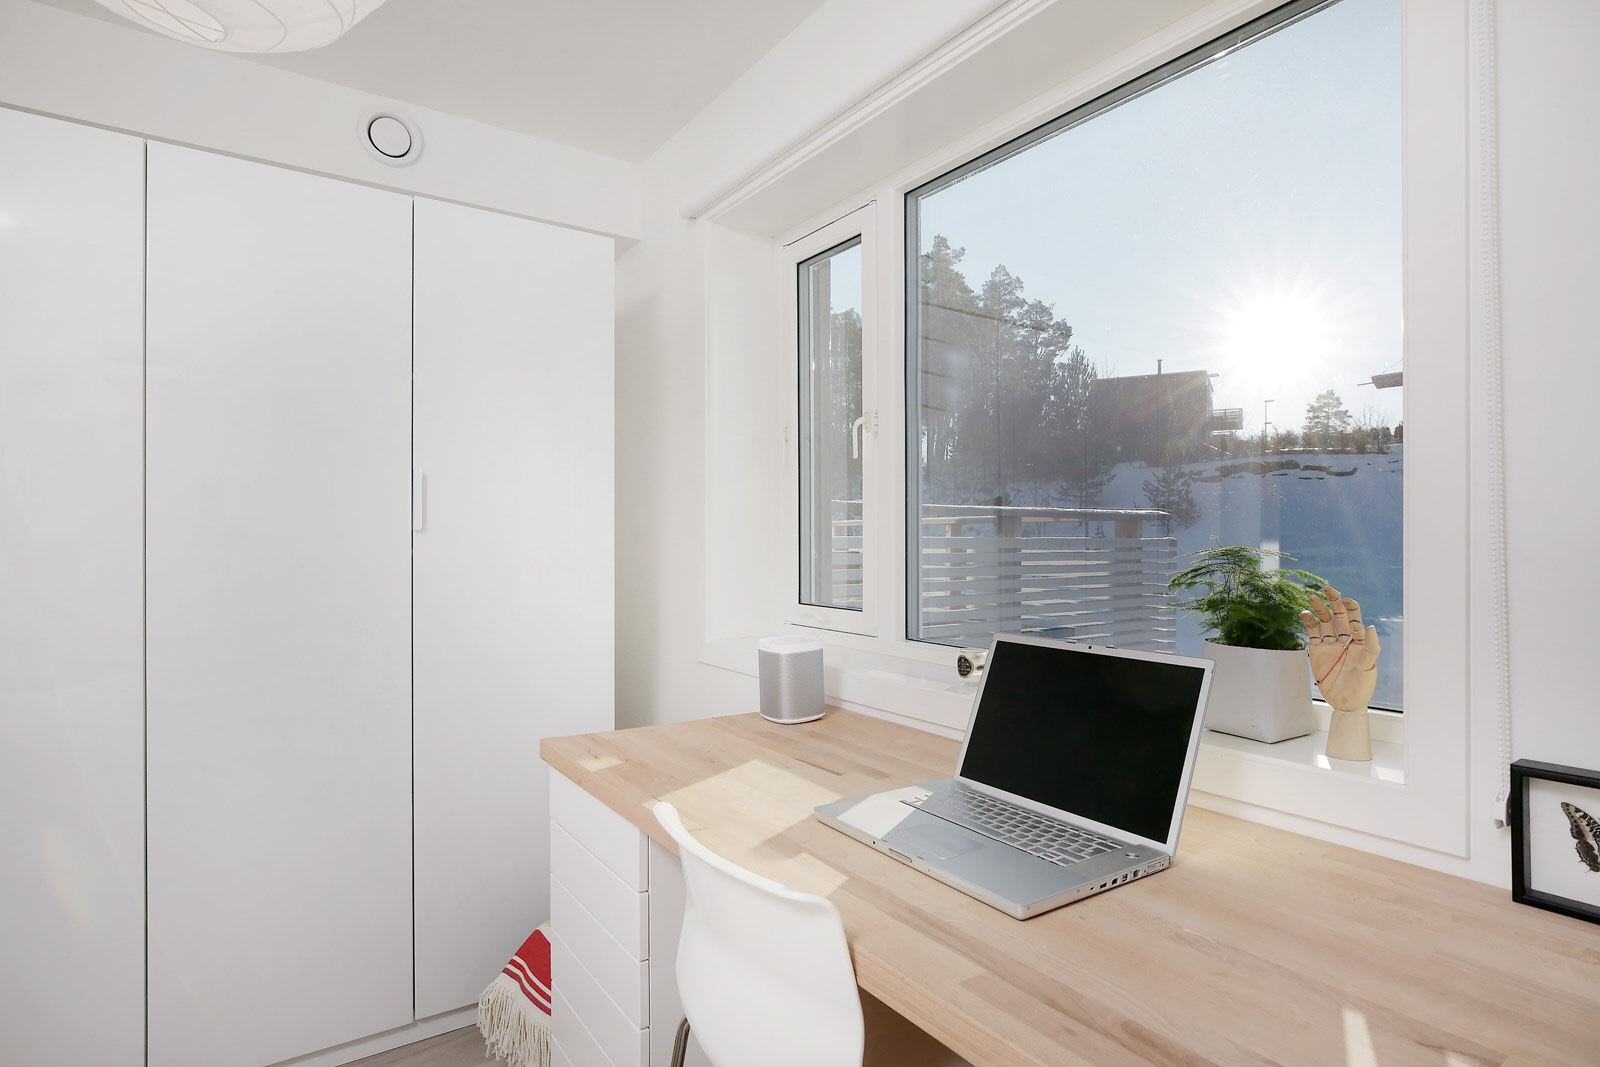 Ikea hack: Desktop with plenty of space   Huskverna